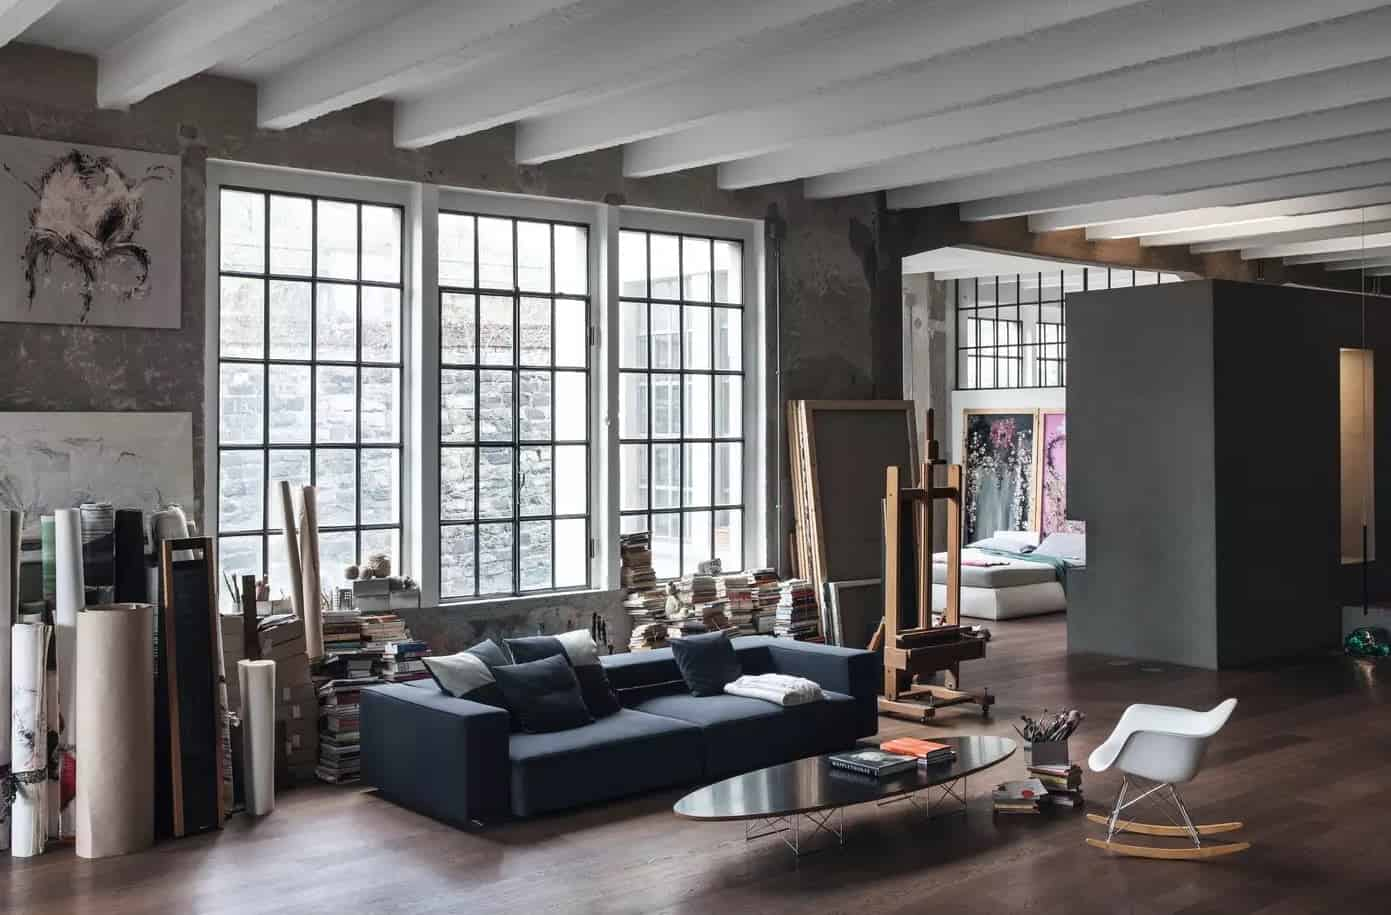 Huur deze prachtige woning via Airbnb